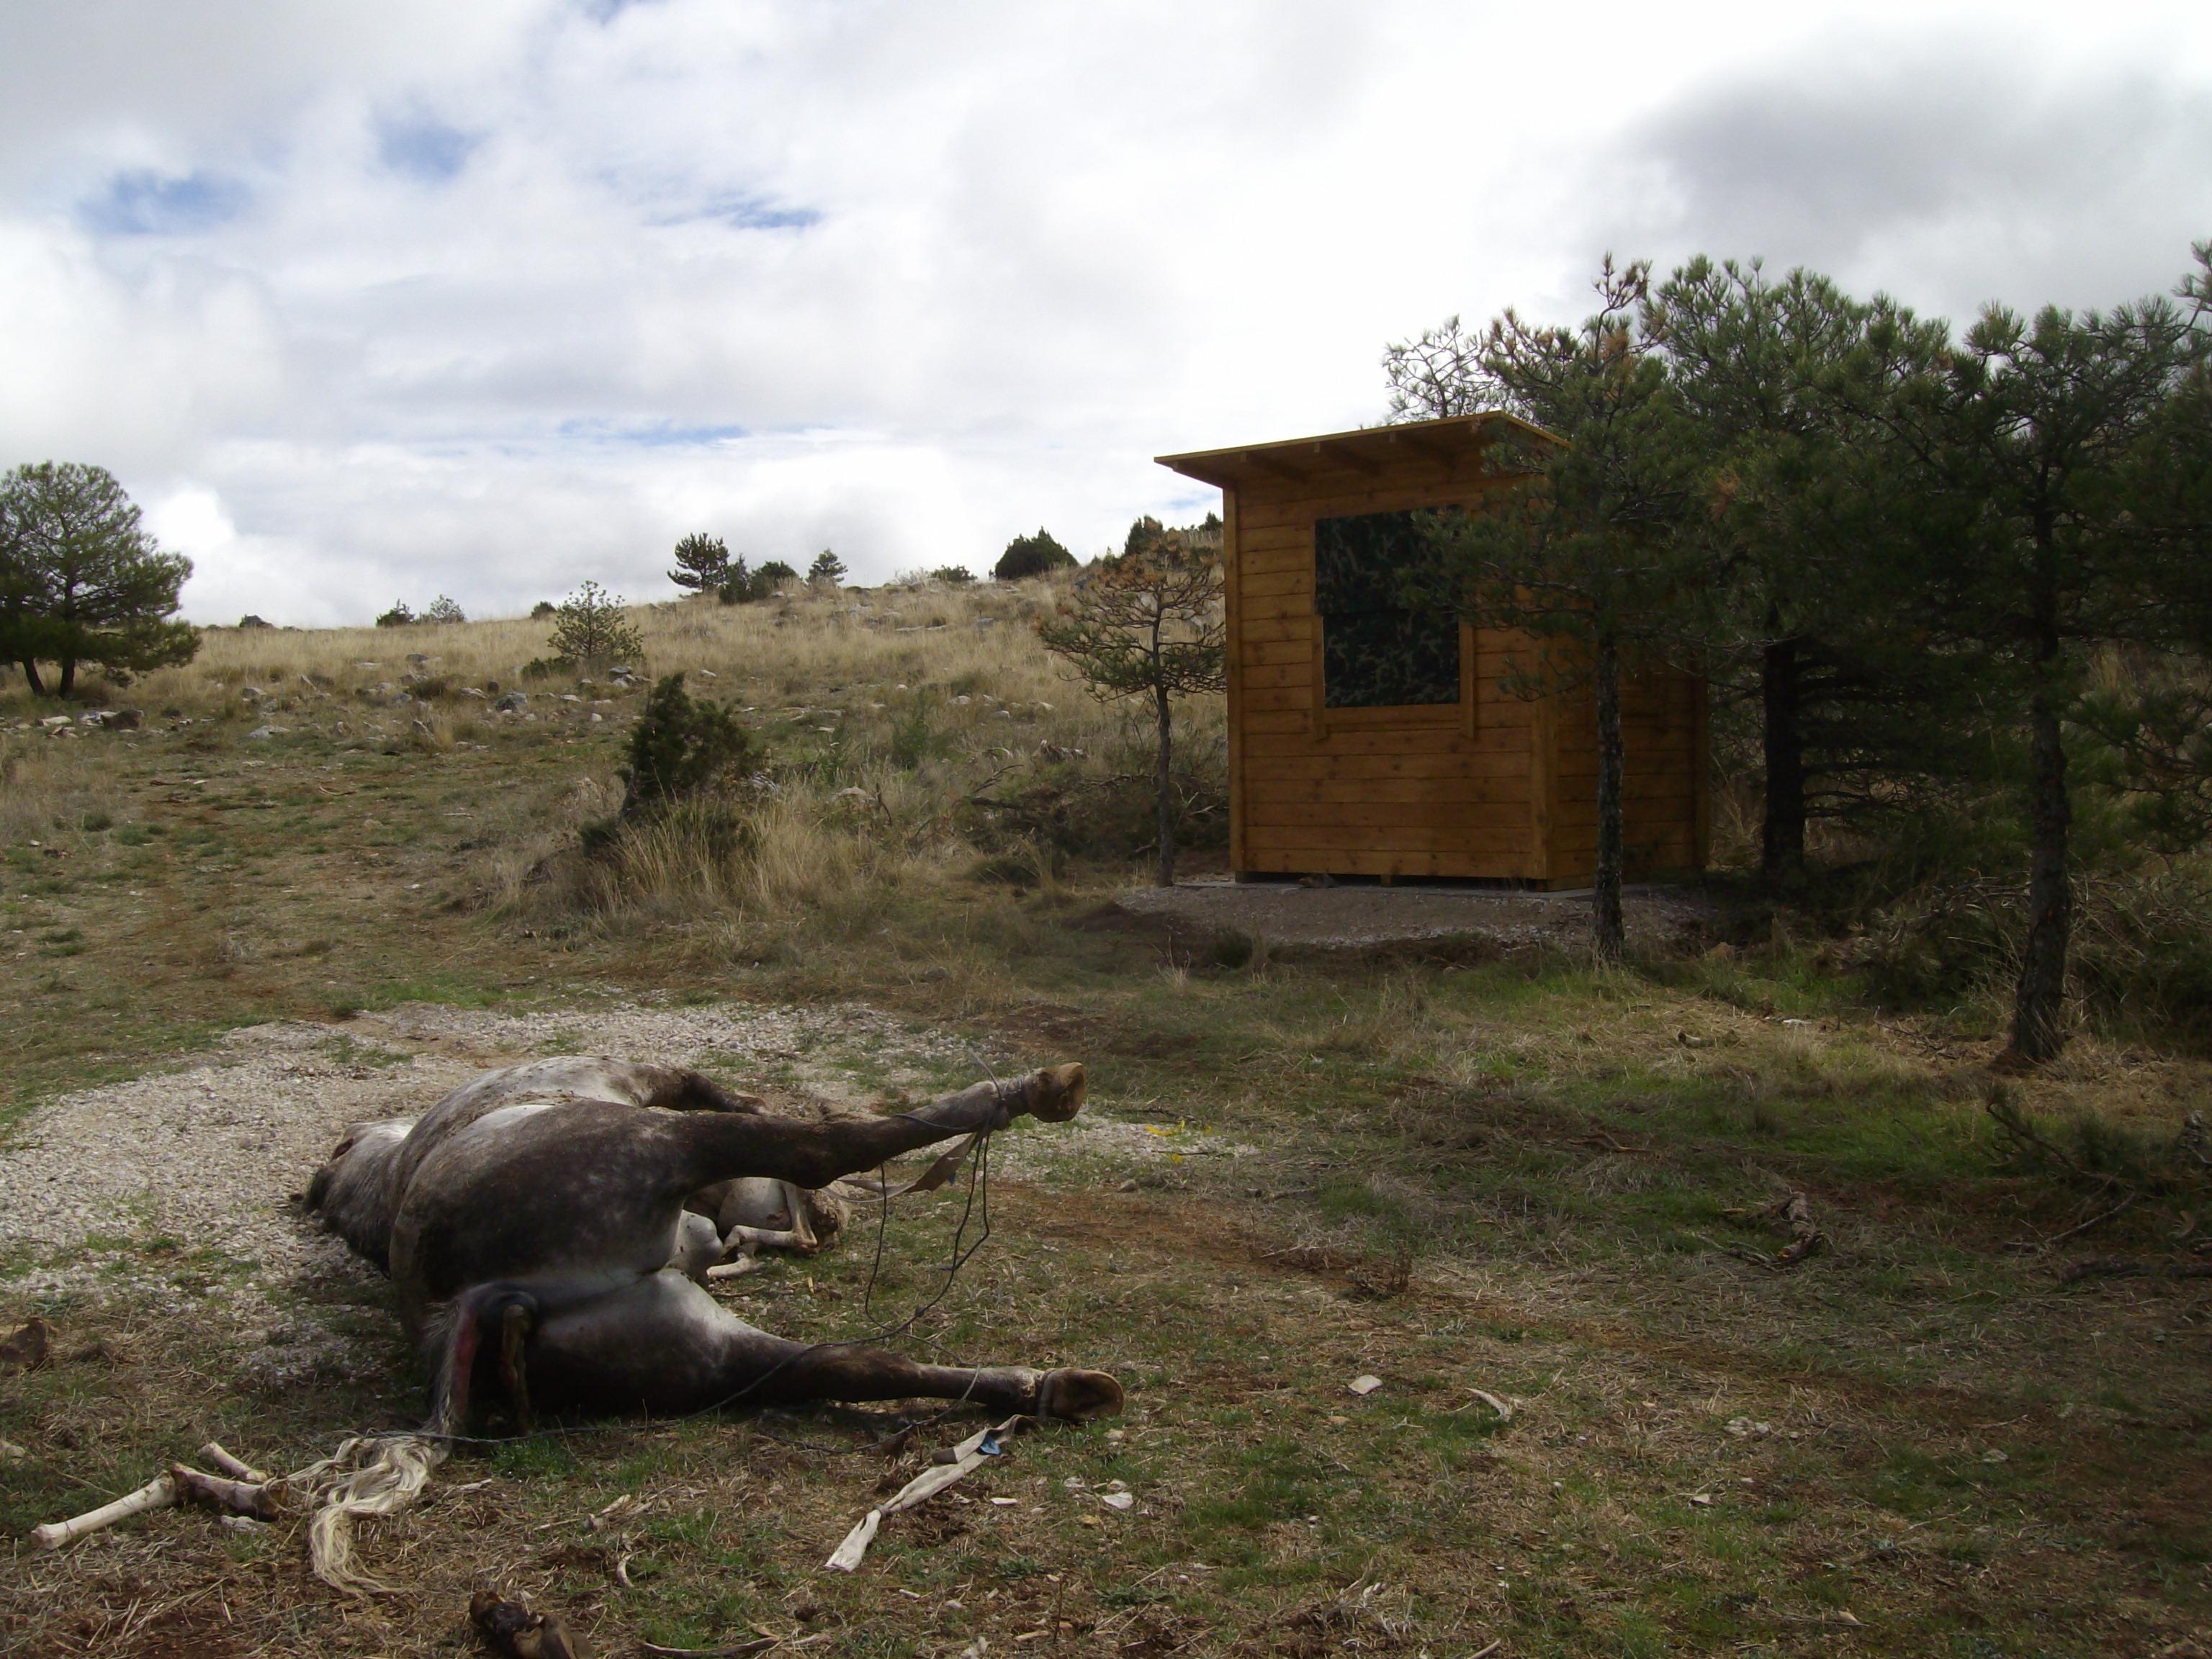 Carroña frente al hide